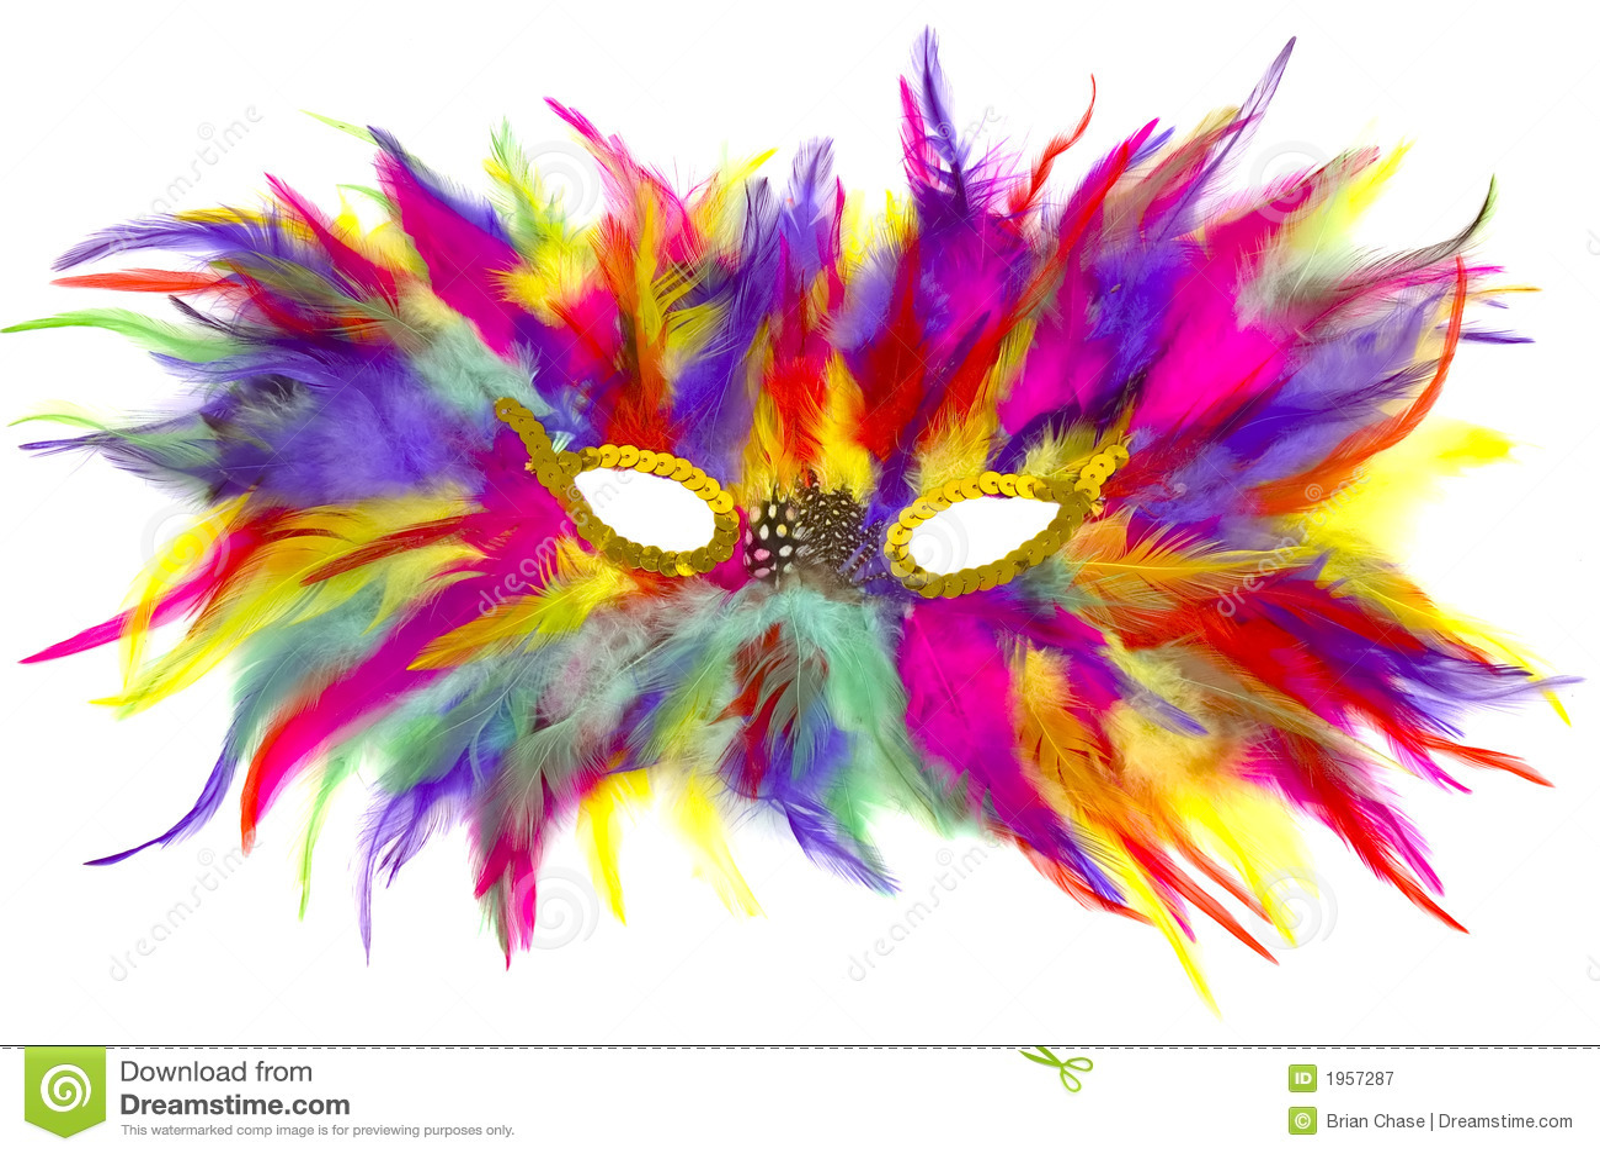 Mardi Gras Mask Royalty Free Stock Photography - Image: 1957287